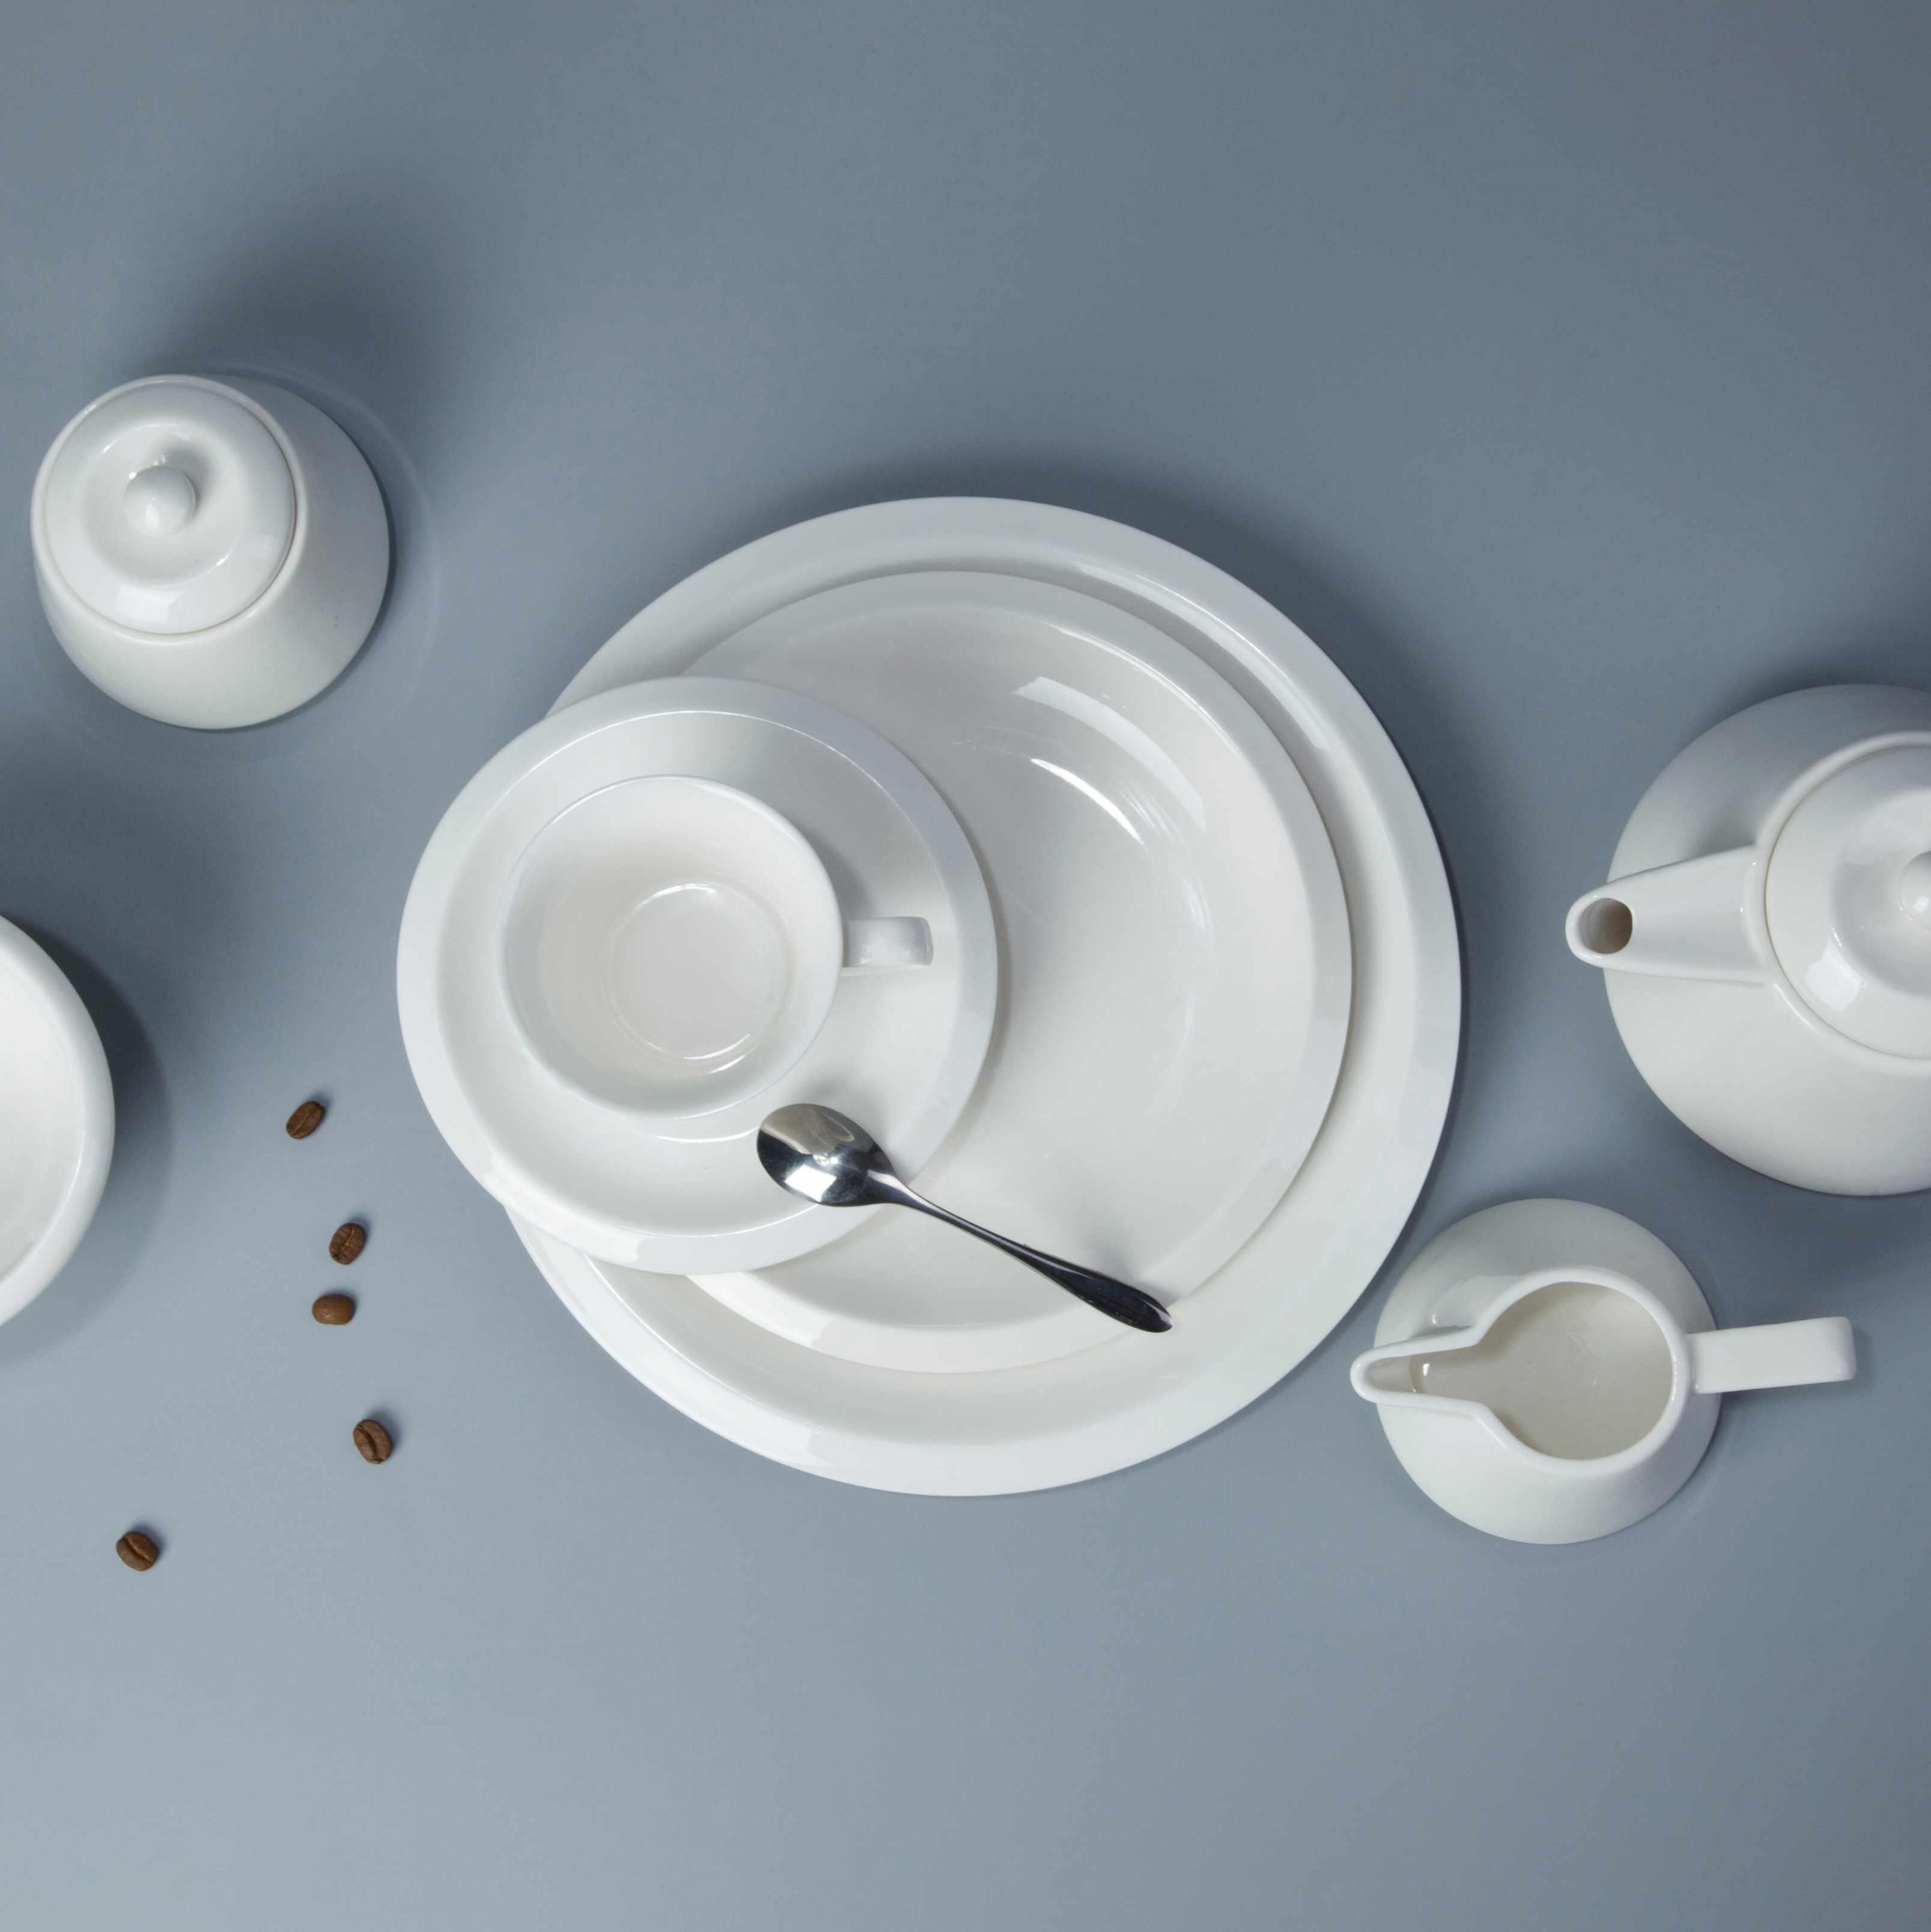 Two Eight White ceramic dinnerware set - XIAO FAN BIAN SERIES White Porcelain Dinner Set image9